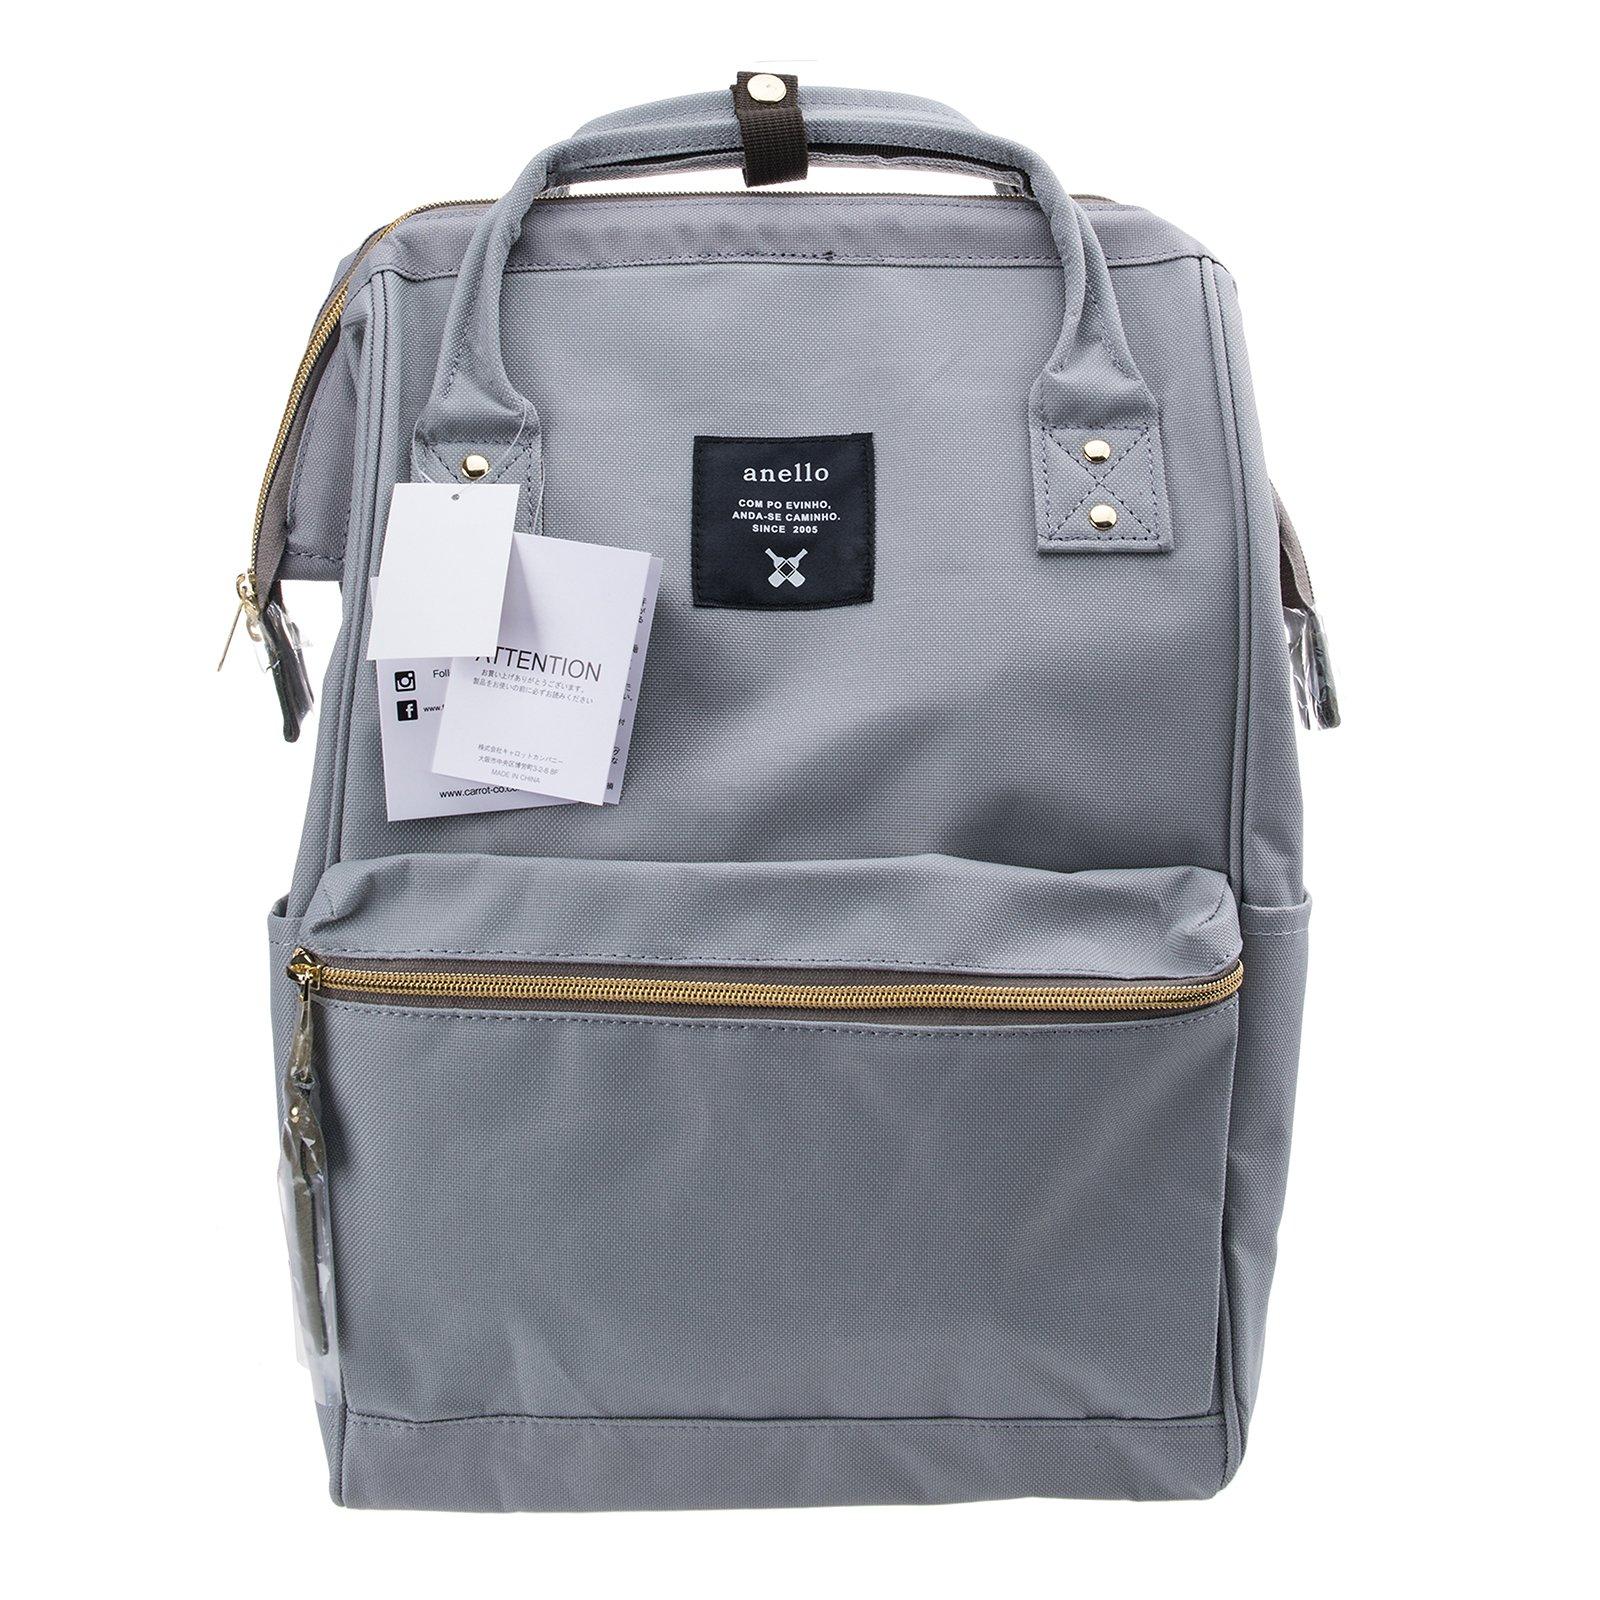 0bbdcfbc26e9 Galleon - Anello Official Grey Japan Fashion Shoulder Rucksack Backpack  Hand Carry Tablet Travel Diaper Bag Unisex